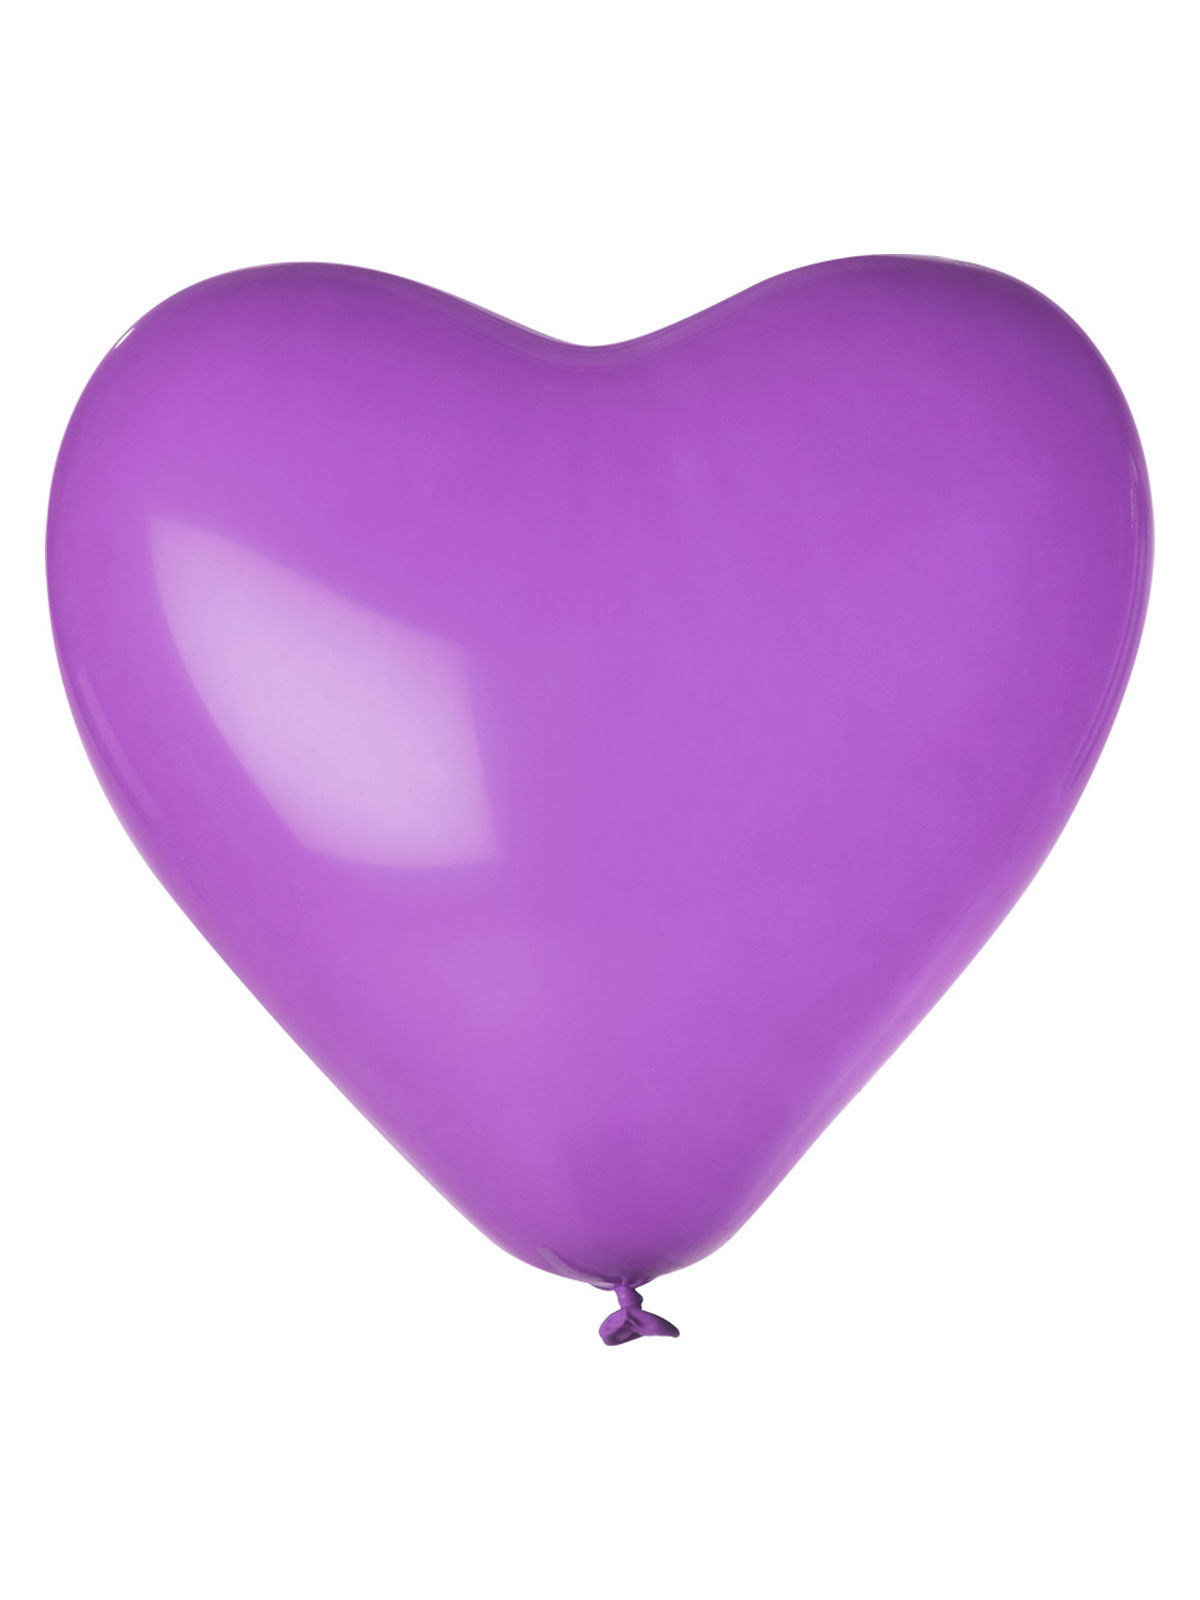 Herz luftballon set 12 st ck ballons party deko lila 33cm g nstige faschings partydeko - Luftballon deko ...